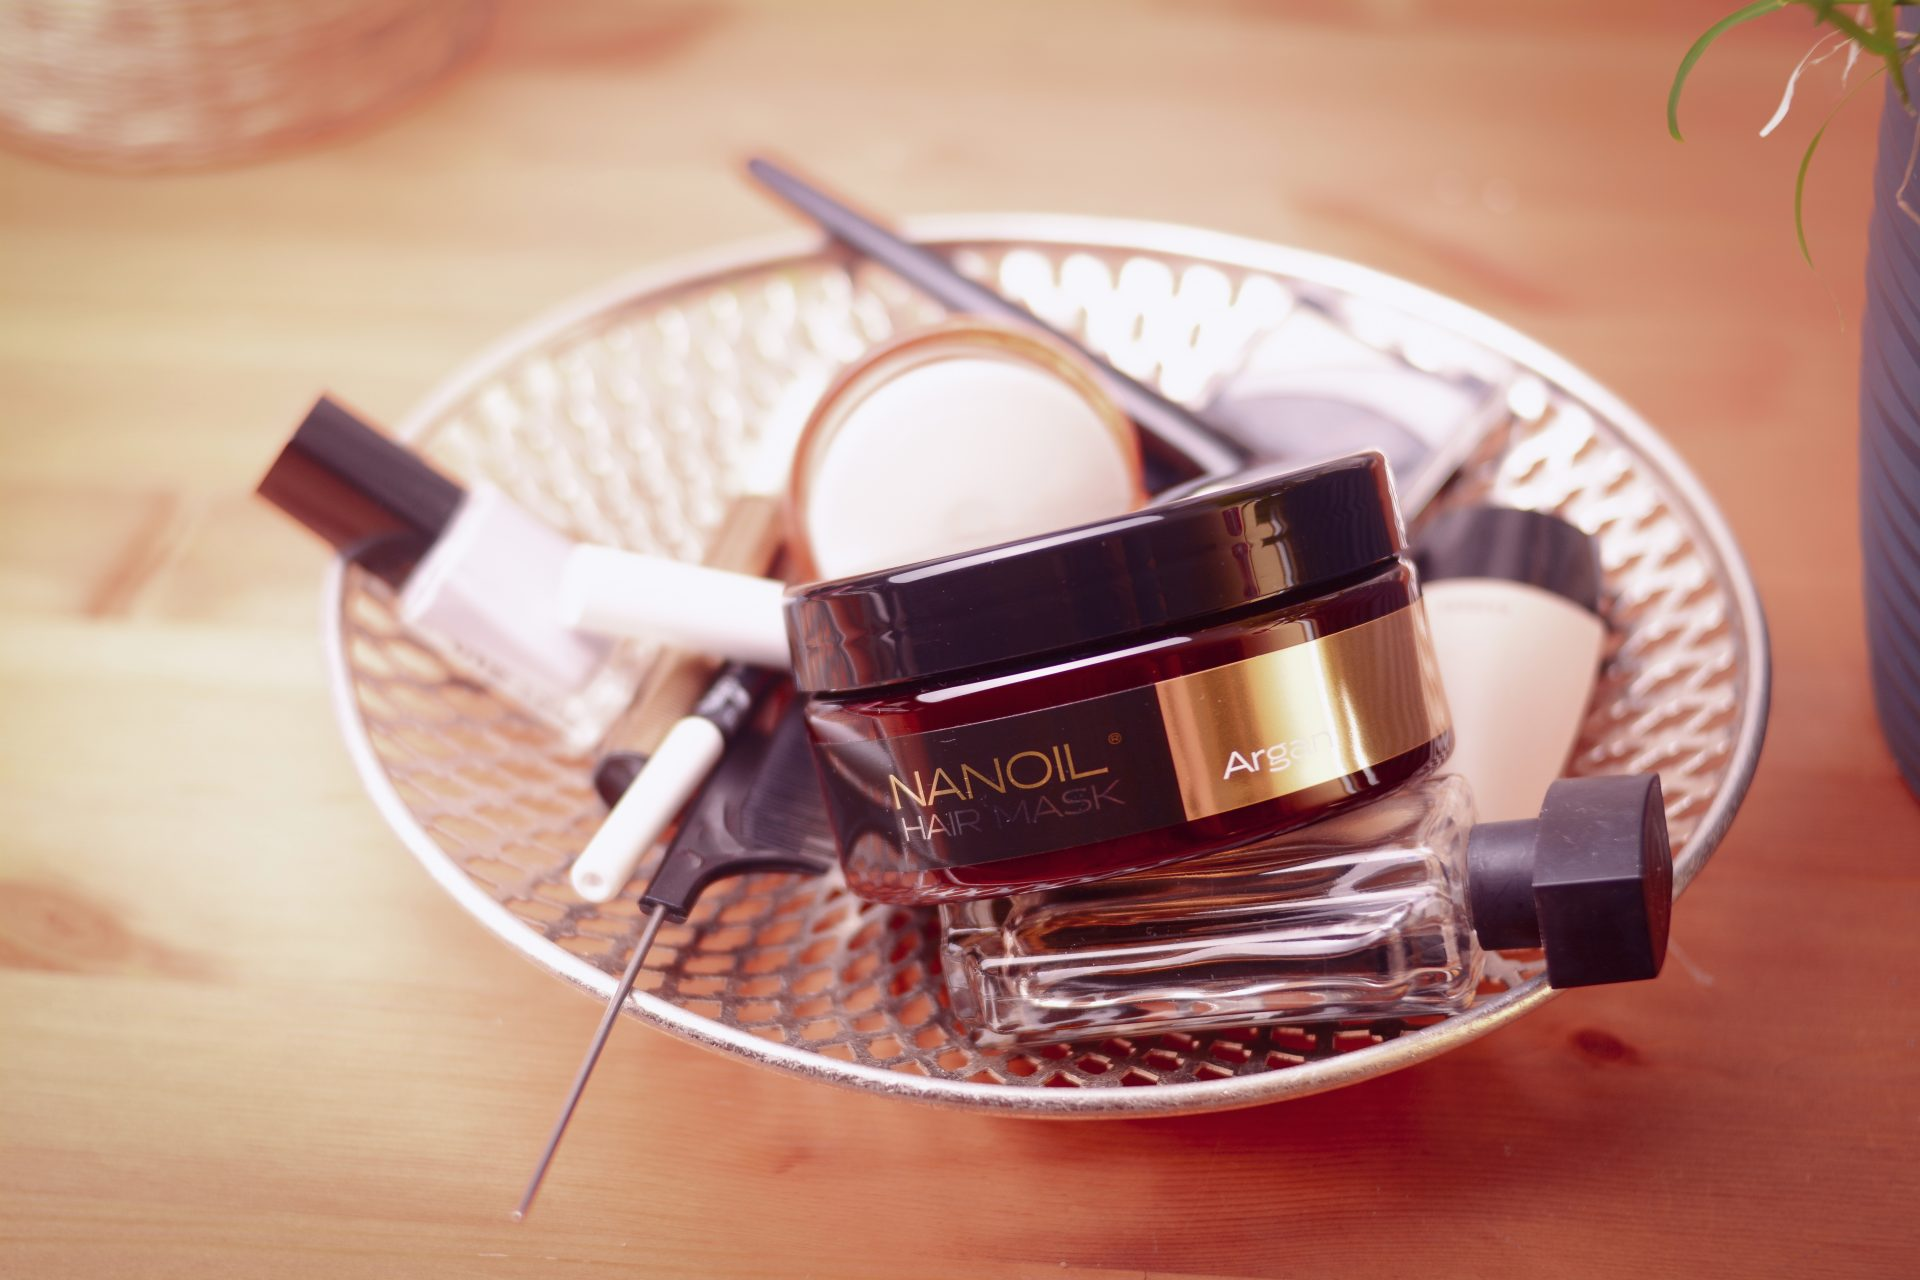 The power of argan oil in the Nanoil Argan Hair Mask. Does it really work?